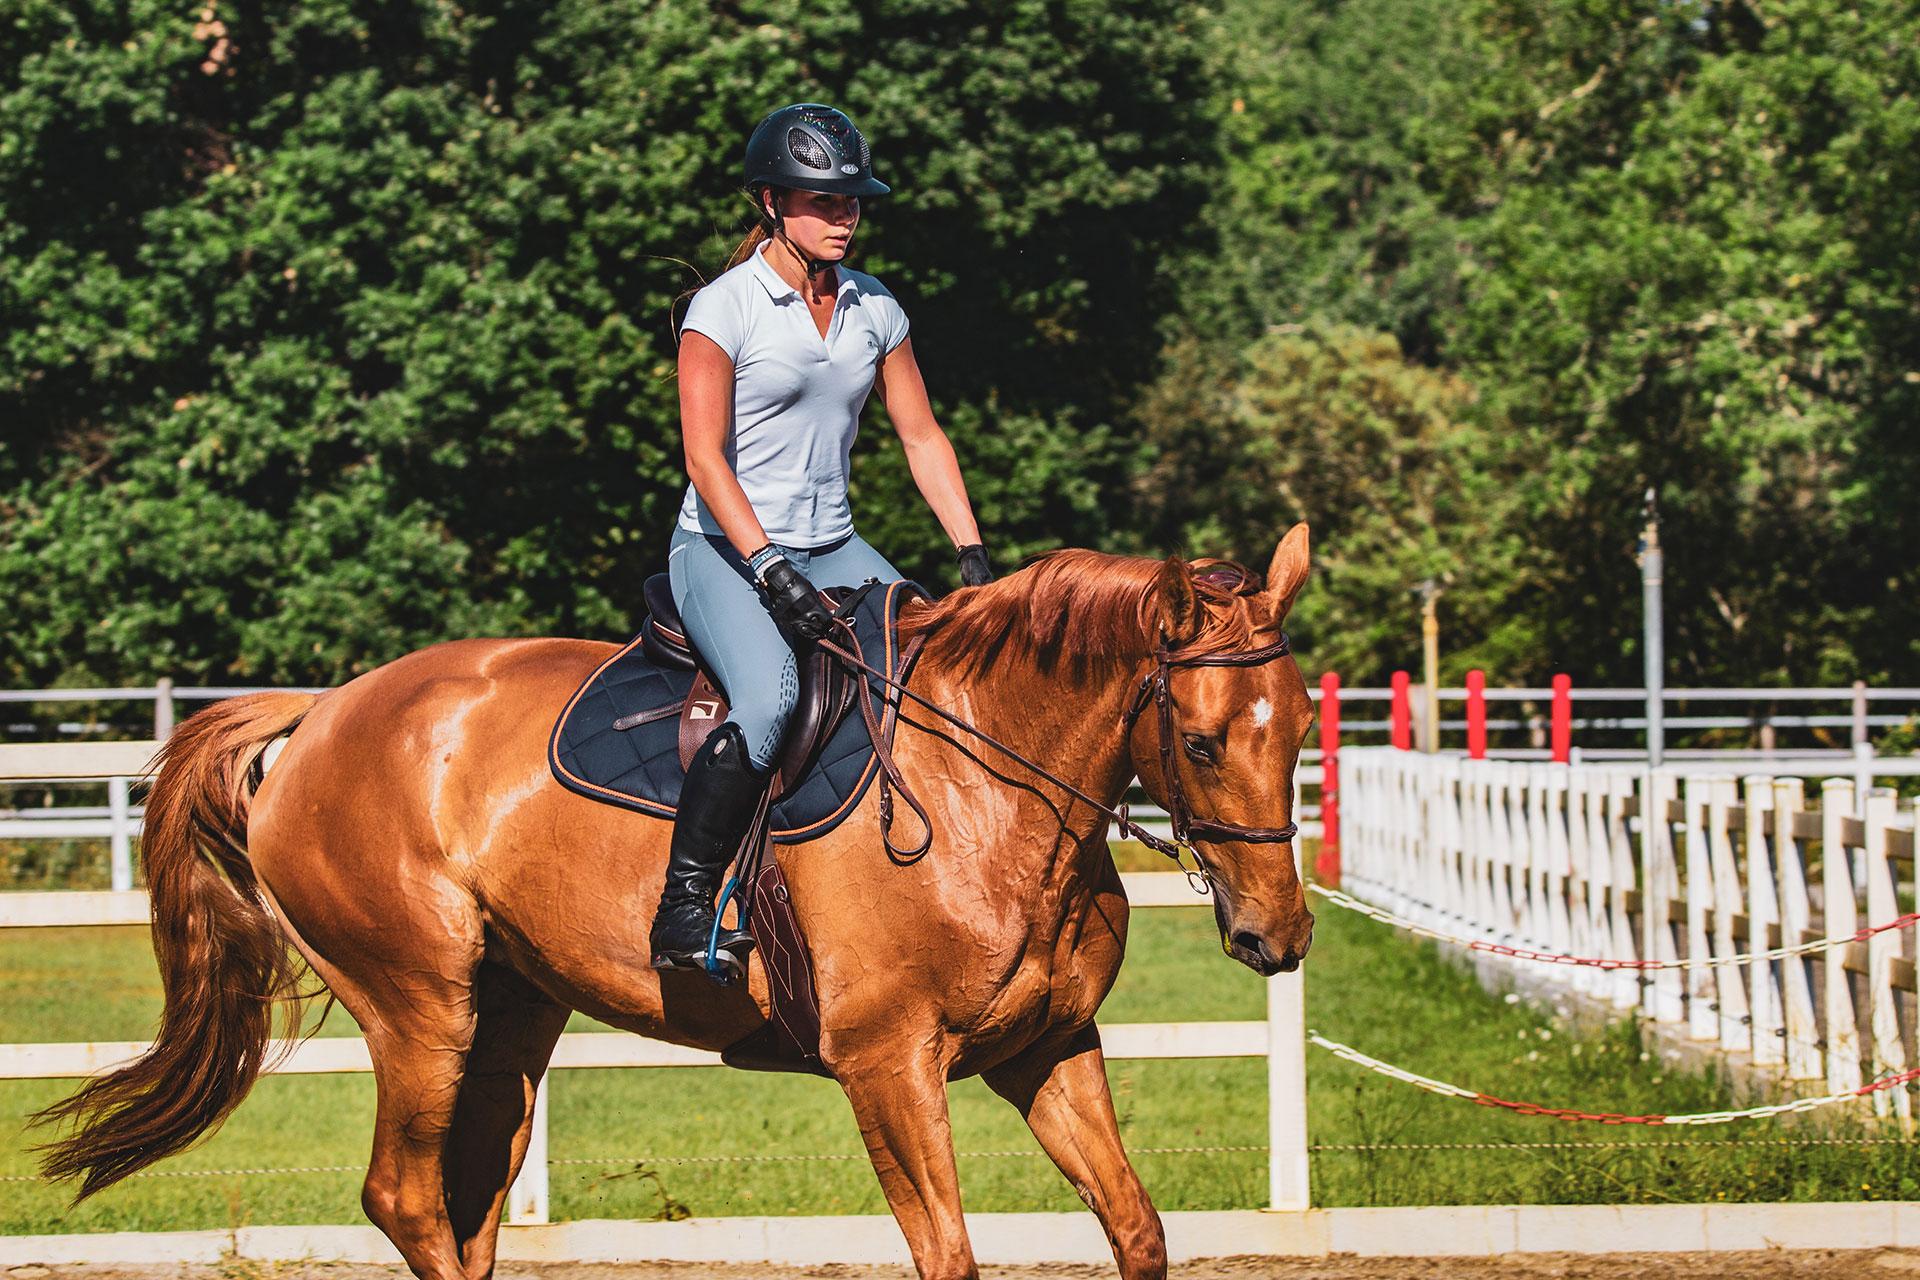 cavallo atleta